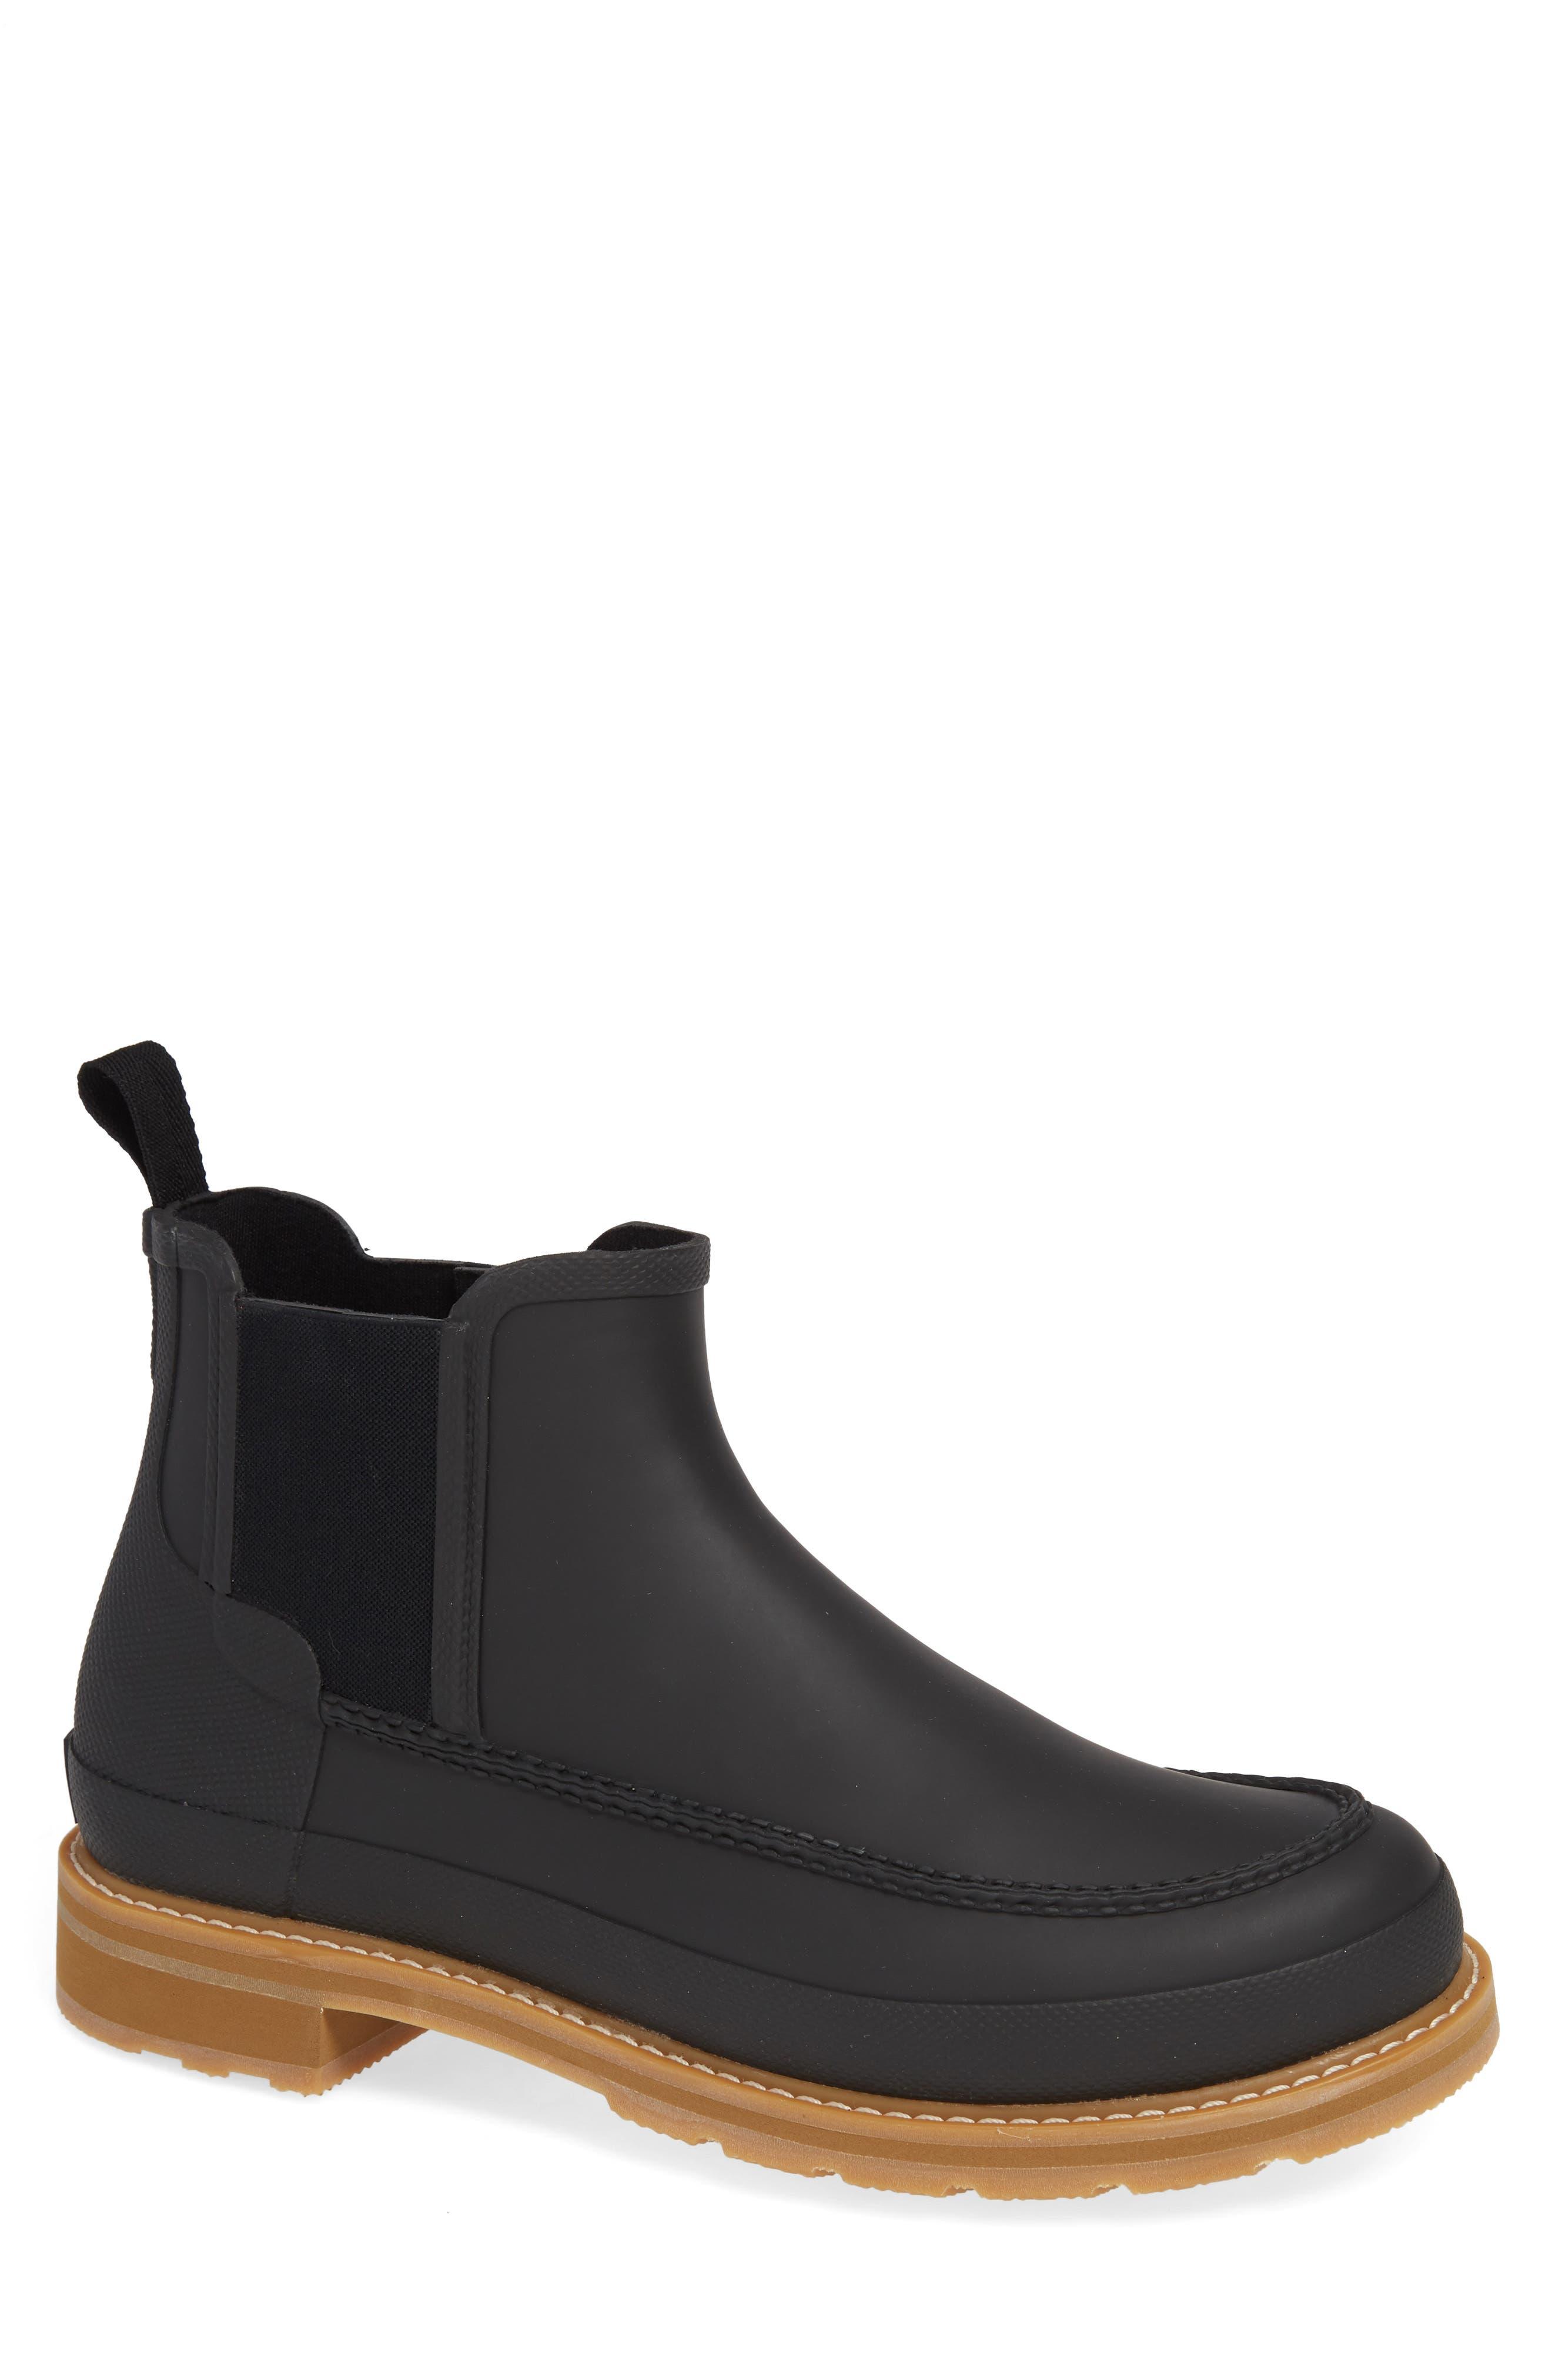 Hunter Moc Toe Waterproof Chelsea Boot, Black